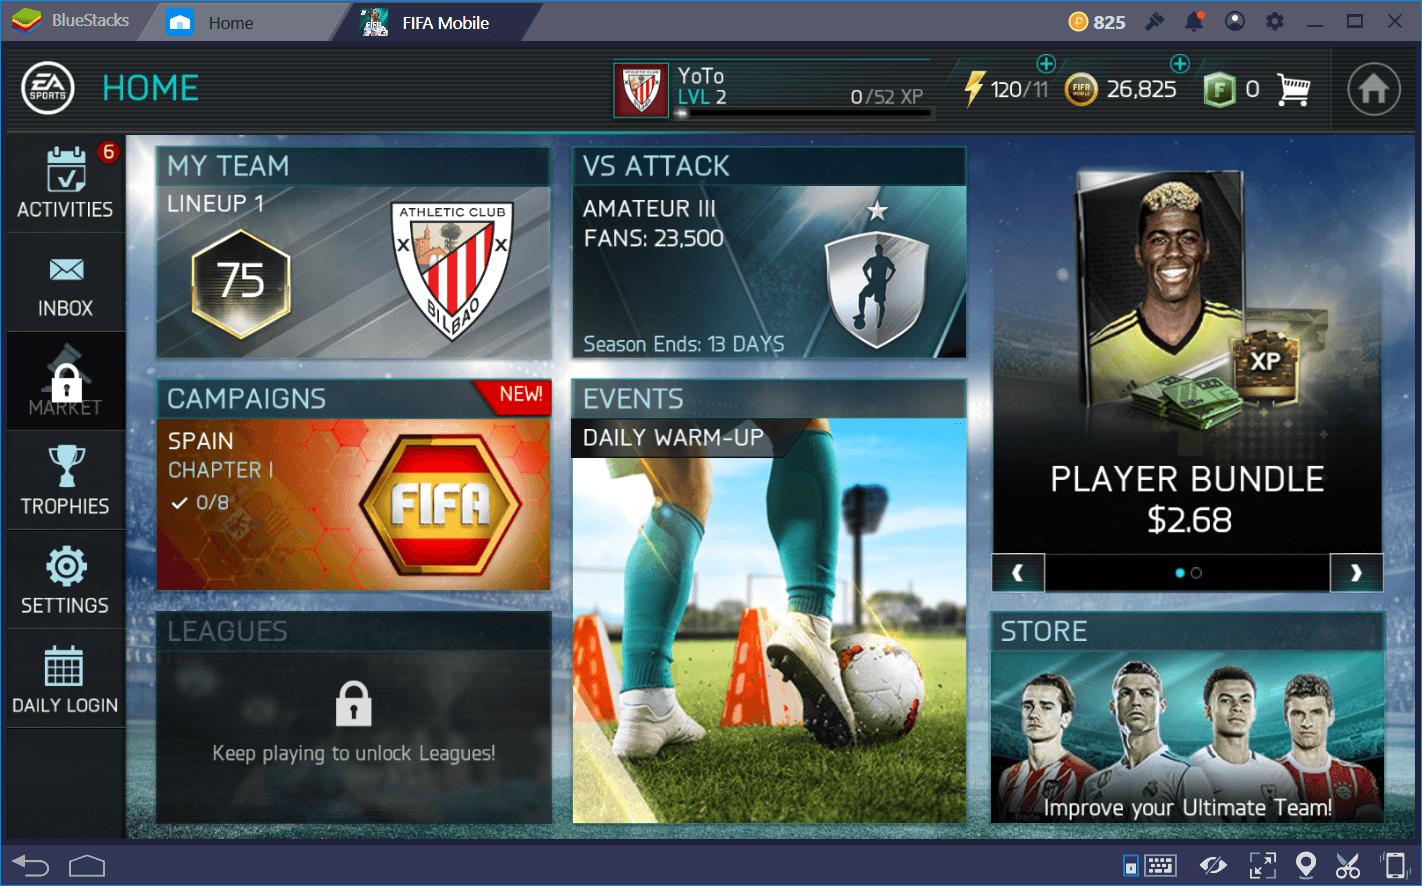 FIFA Fußball (FIFA Mobile) Anfänger Anleitung